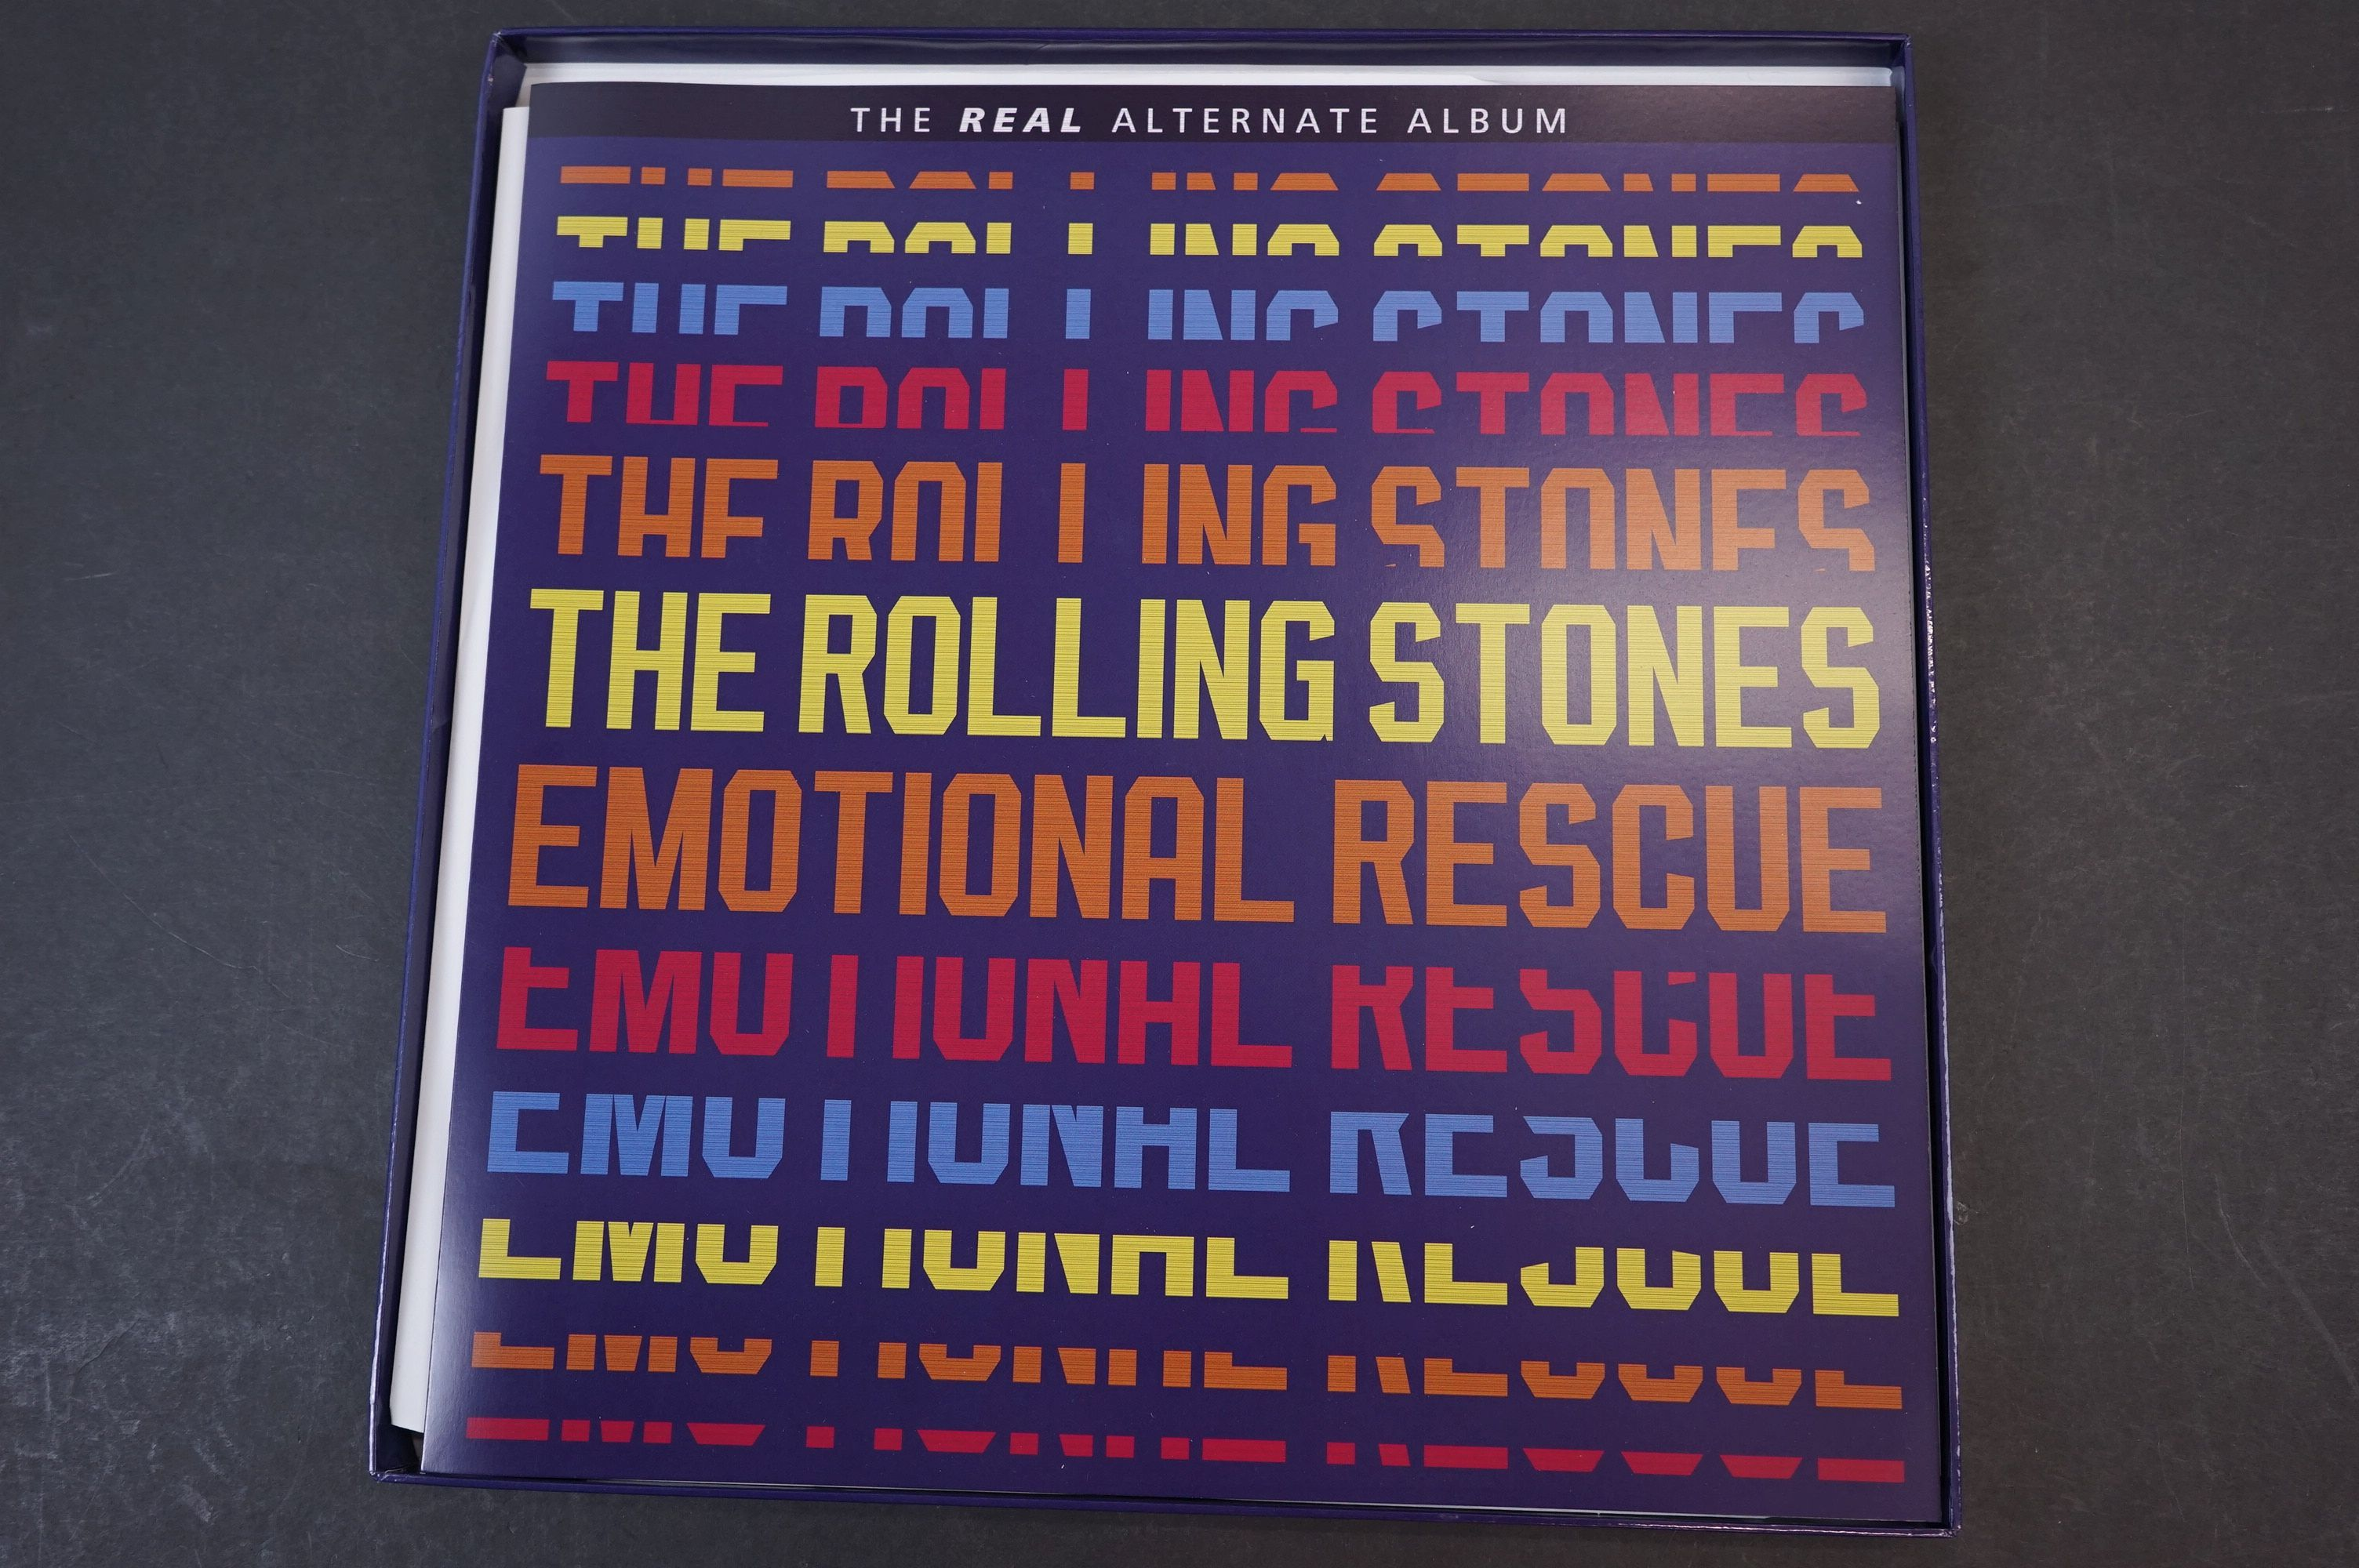 Vinyl - ltd edn The Real Alternate Album Rolling Stones Emotional Rescue 4 LP / 2 CD Box Set, - Image 3 of 12